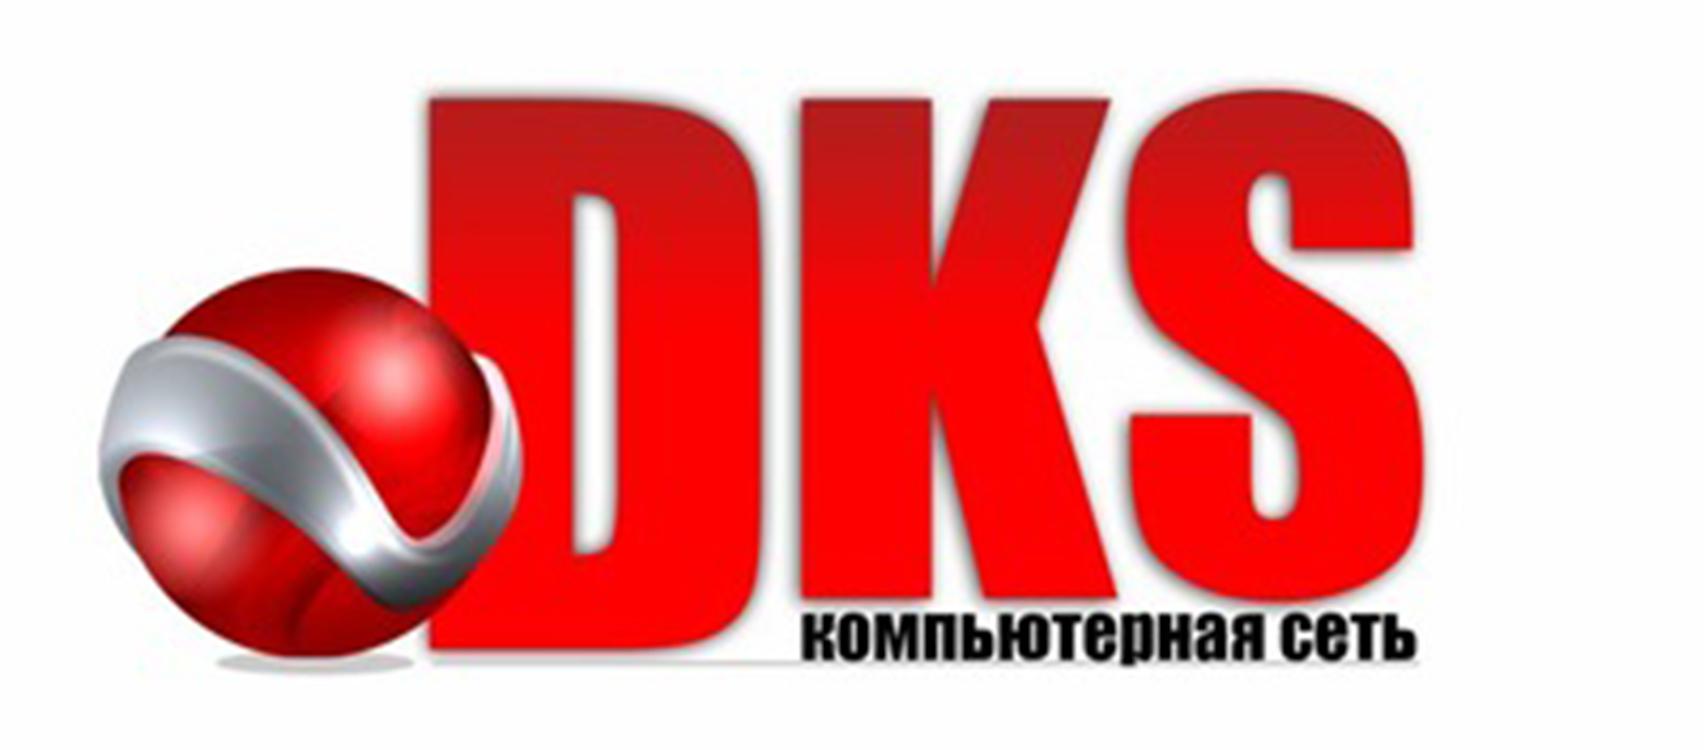 DKC (Житомир)